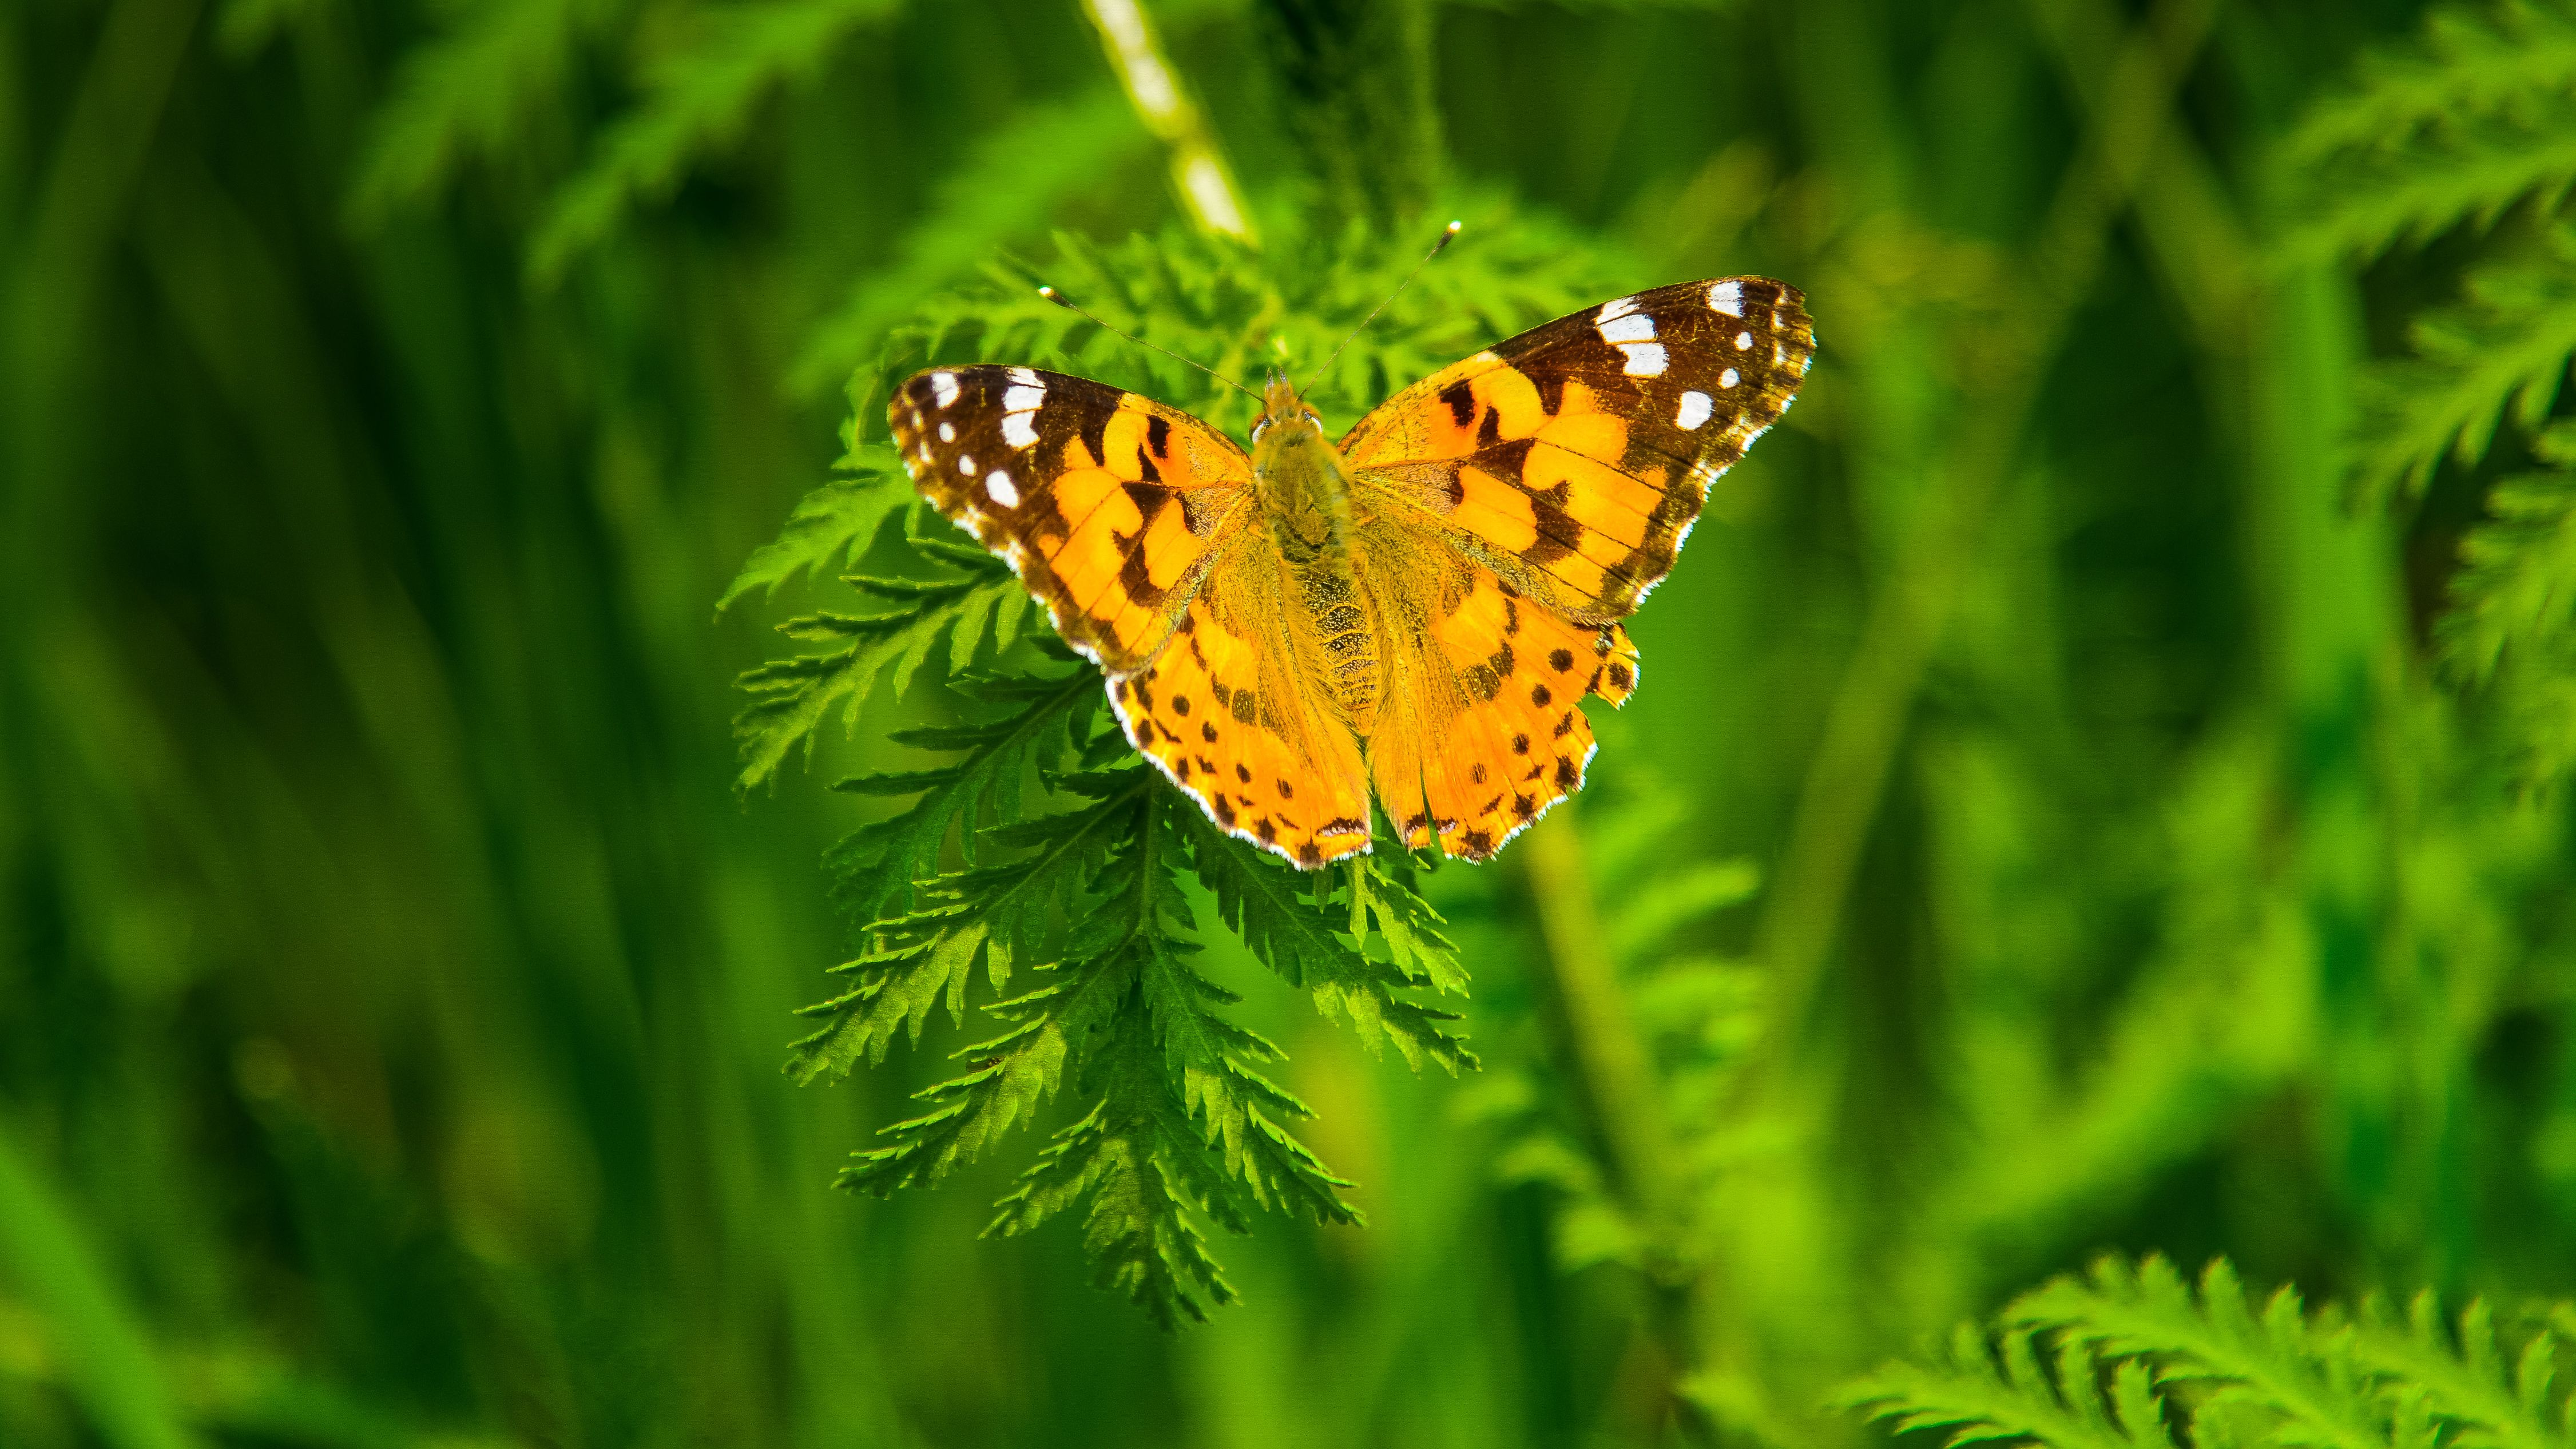 4k Butterfly Wallpapers Top Free 4k Butterfly Backgrounds Wallpaperaccess